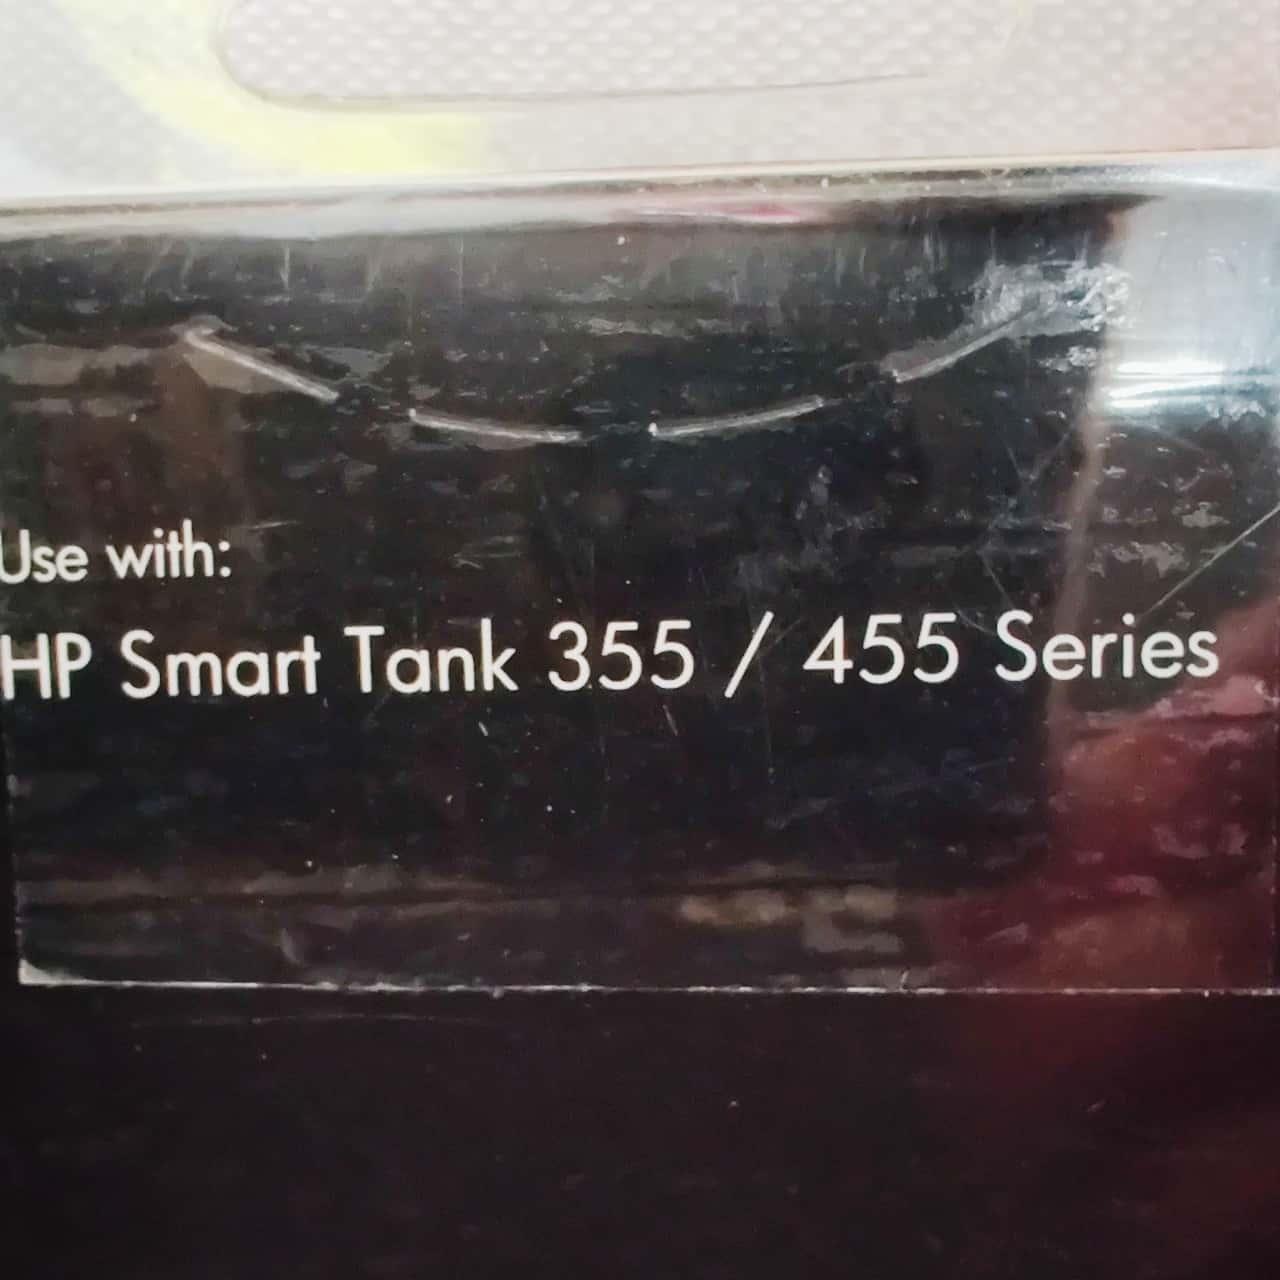 HP Printer Black Ink 135ml Bottle for Hp Smart Tank 355/455 series